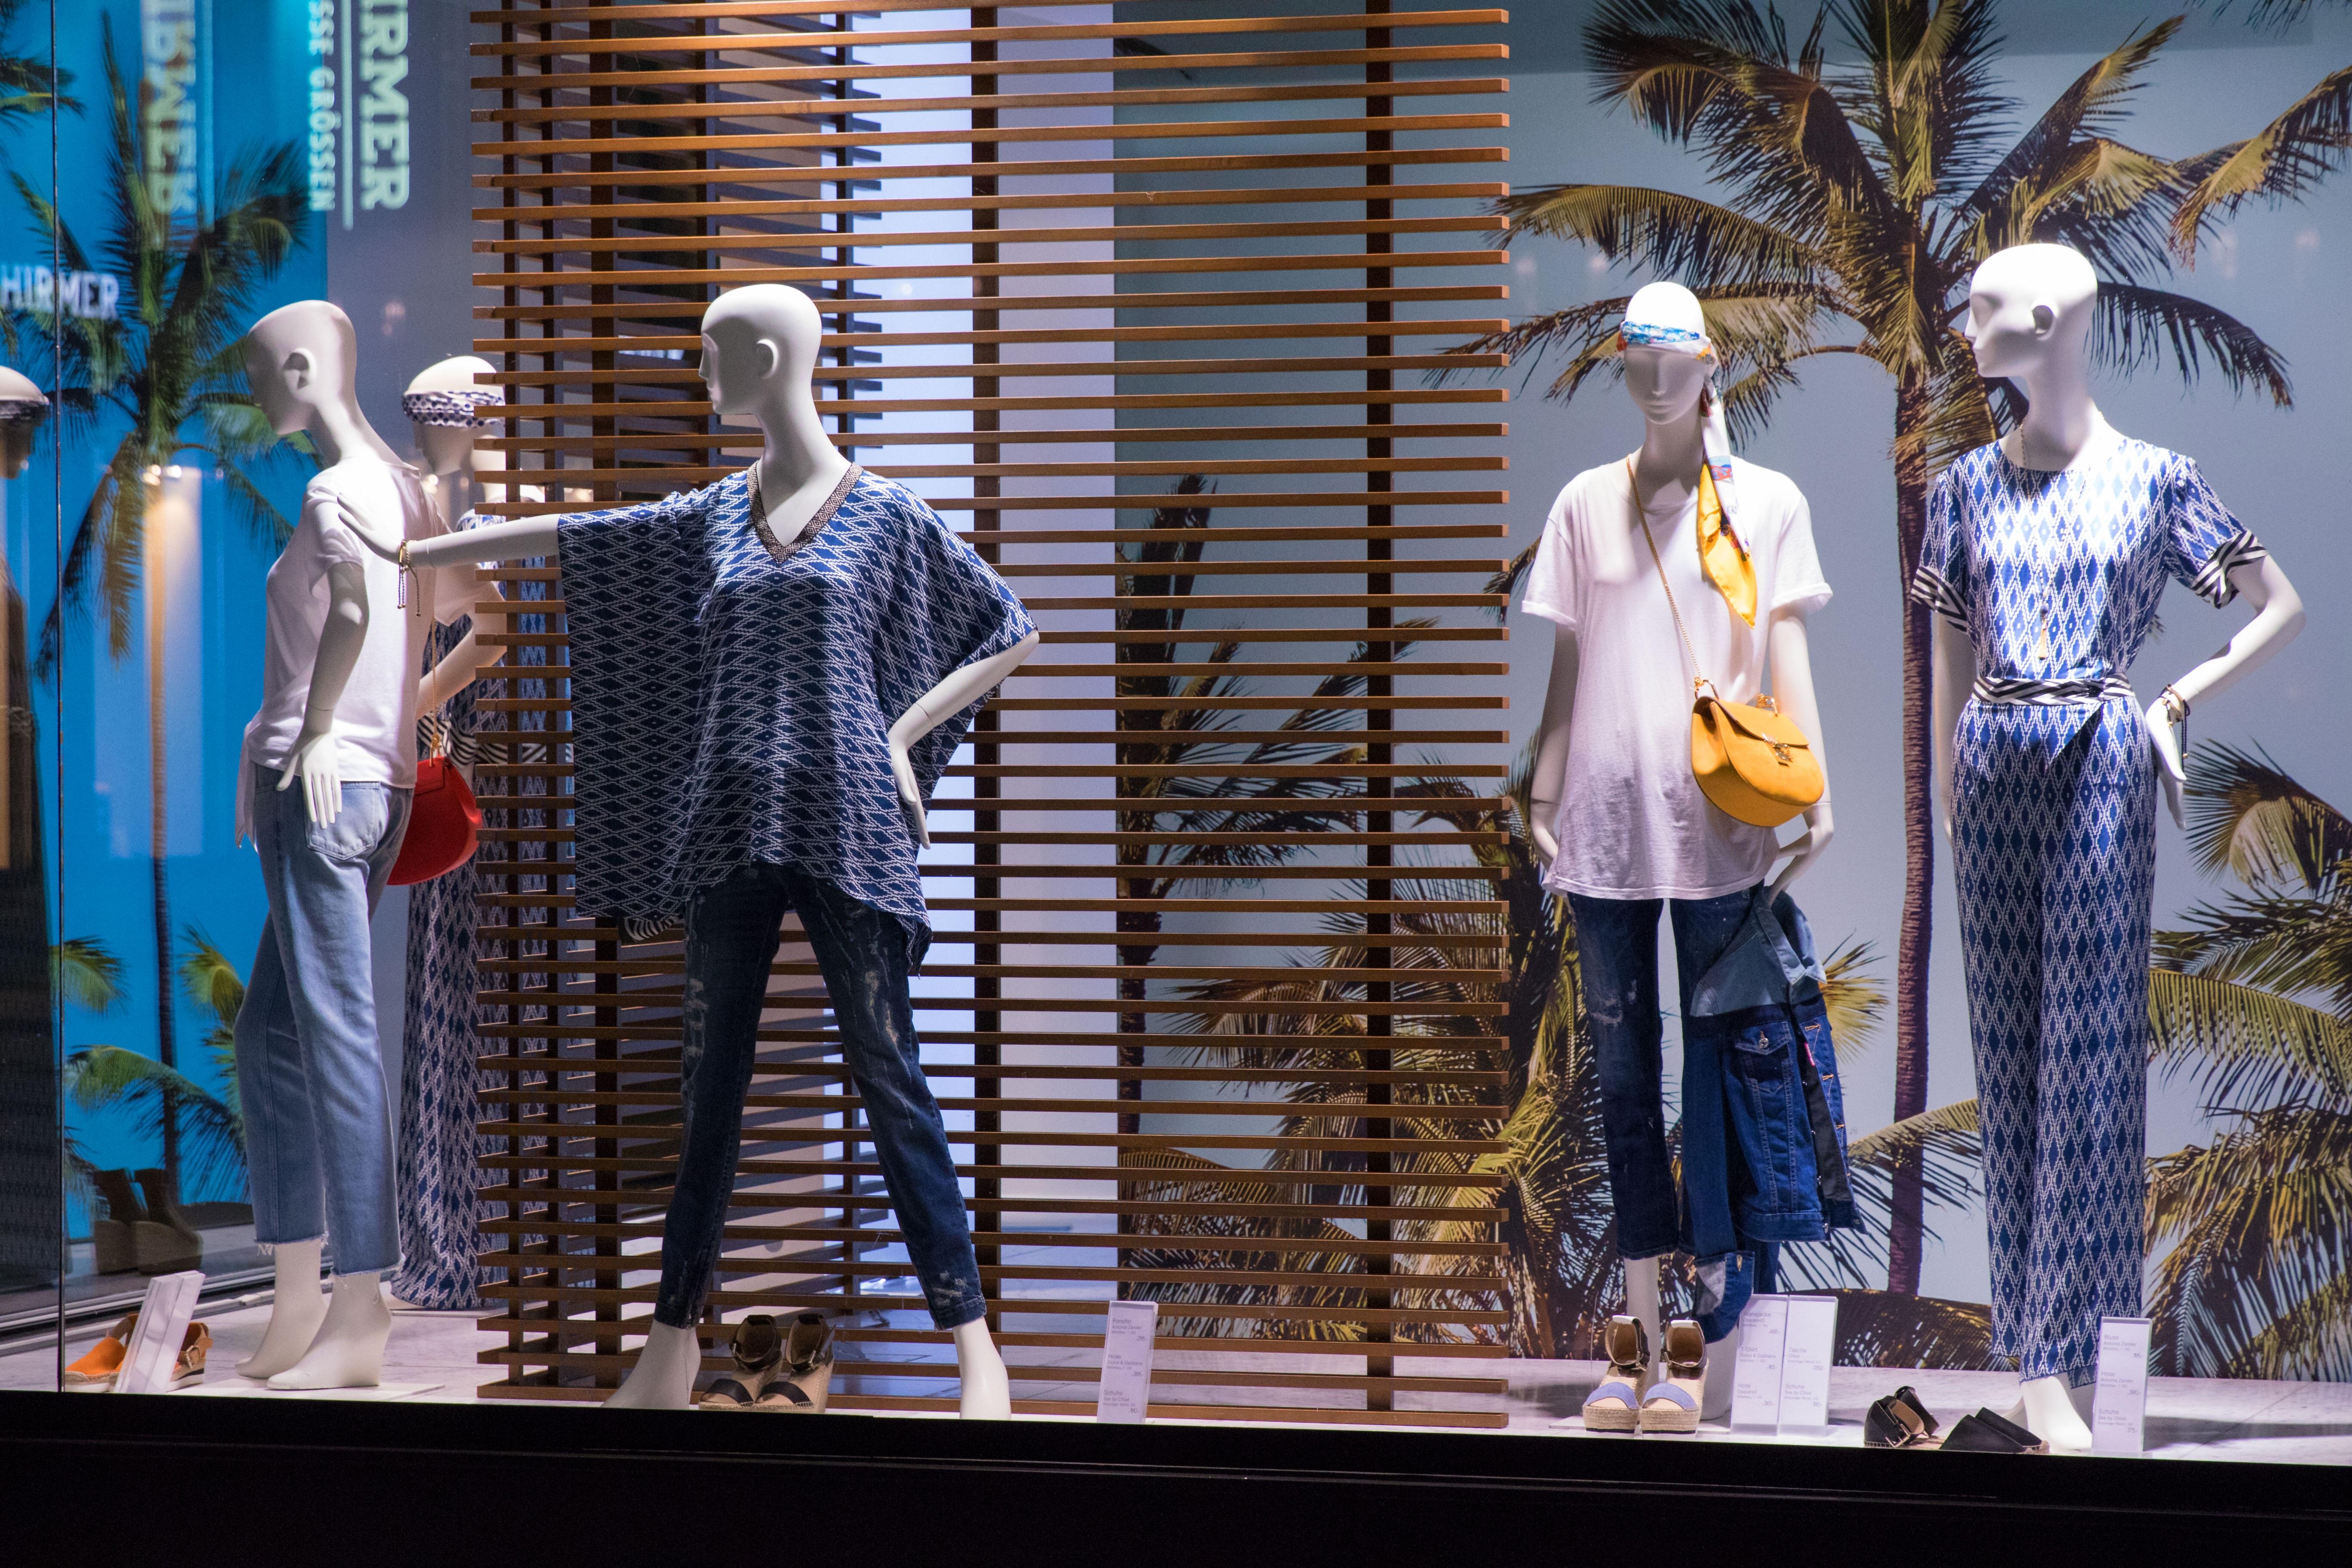 Free Images : atmosphere, advertising, decoration, fashion, clothing ...